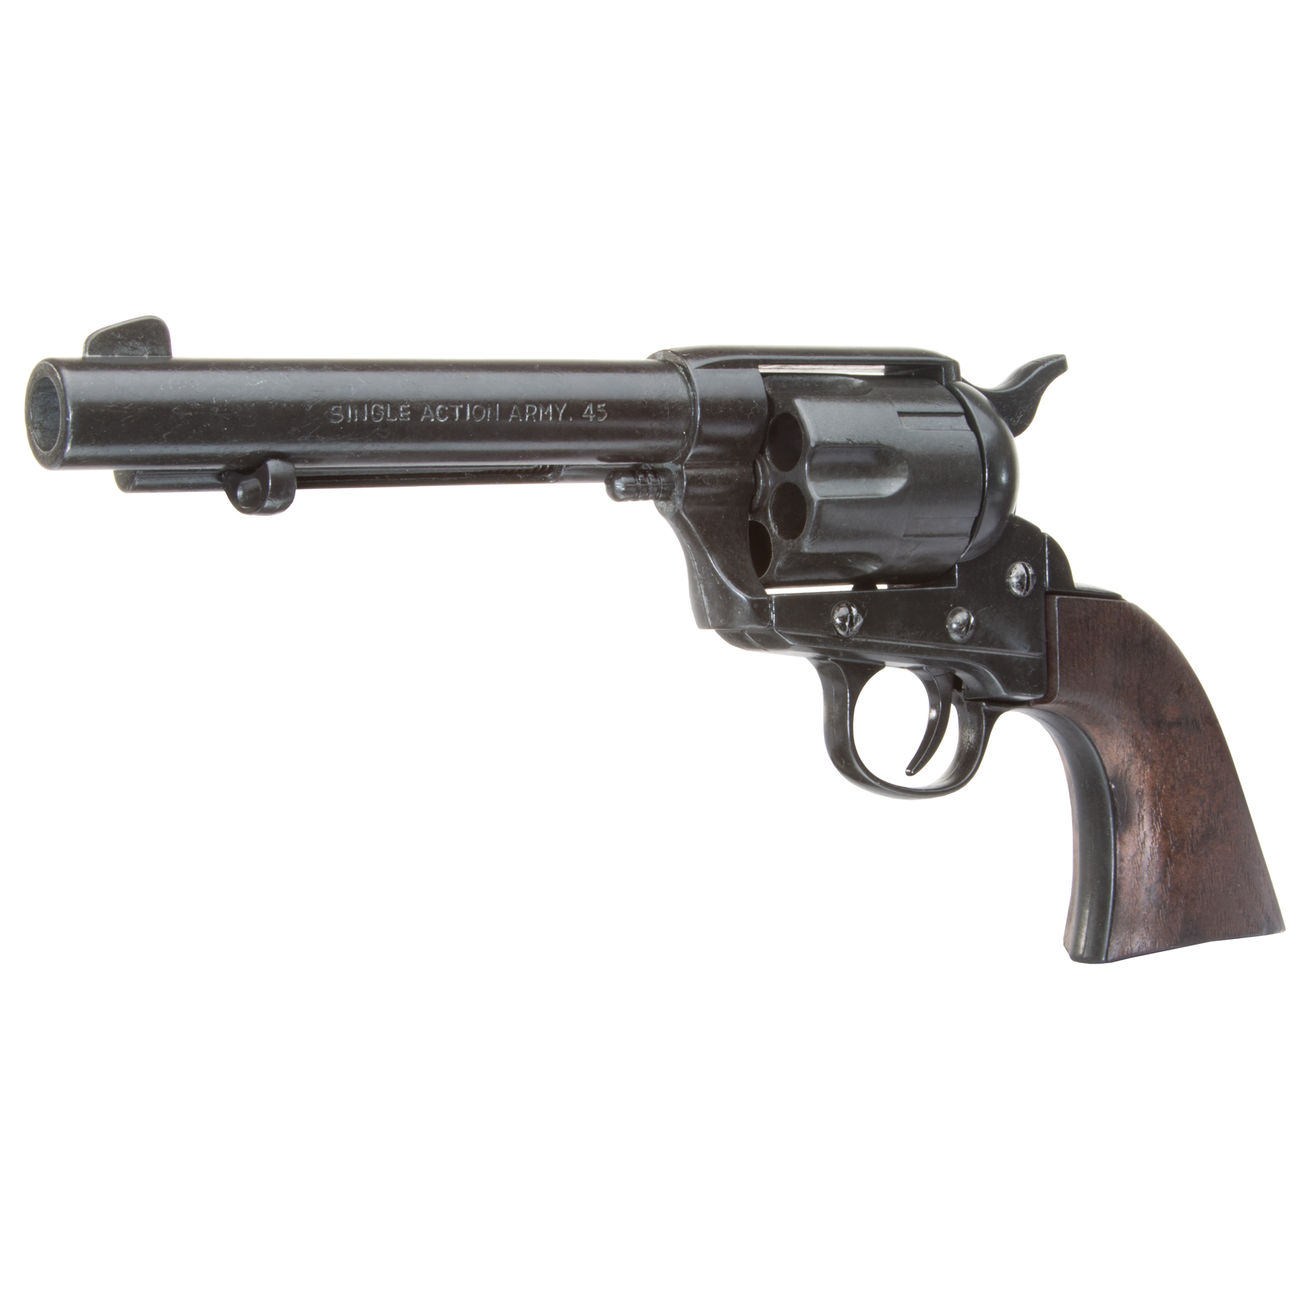 Deko revolver schwarz kotte zeller - Deko tablett schwarz ...